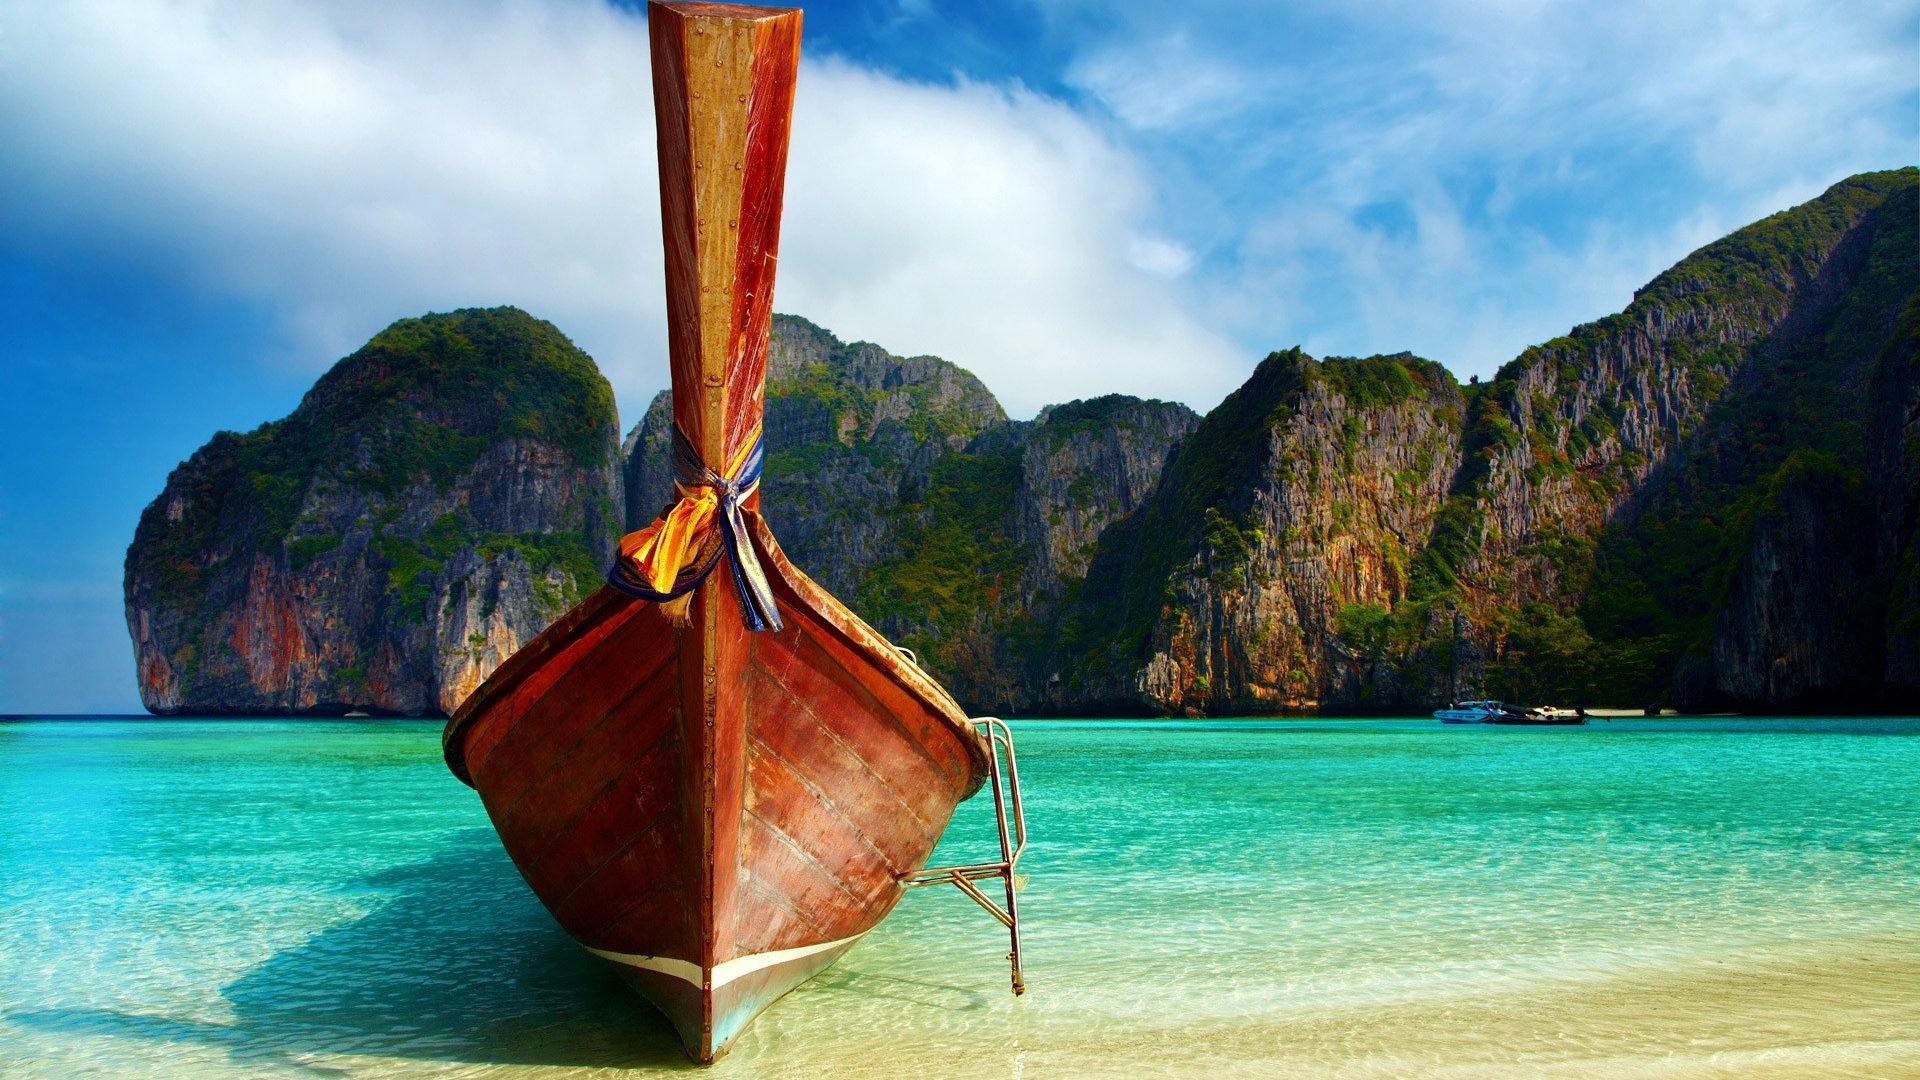 Boats Boat Nature Ocean Beautiful Thailand Sea Beach Beaches Rocks Oceans  Iphone Wallpaper – 1920×1200